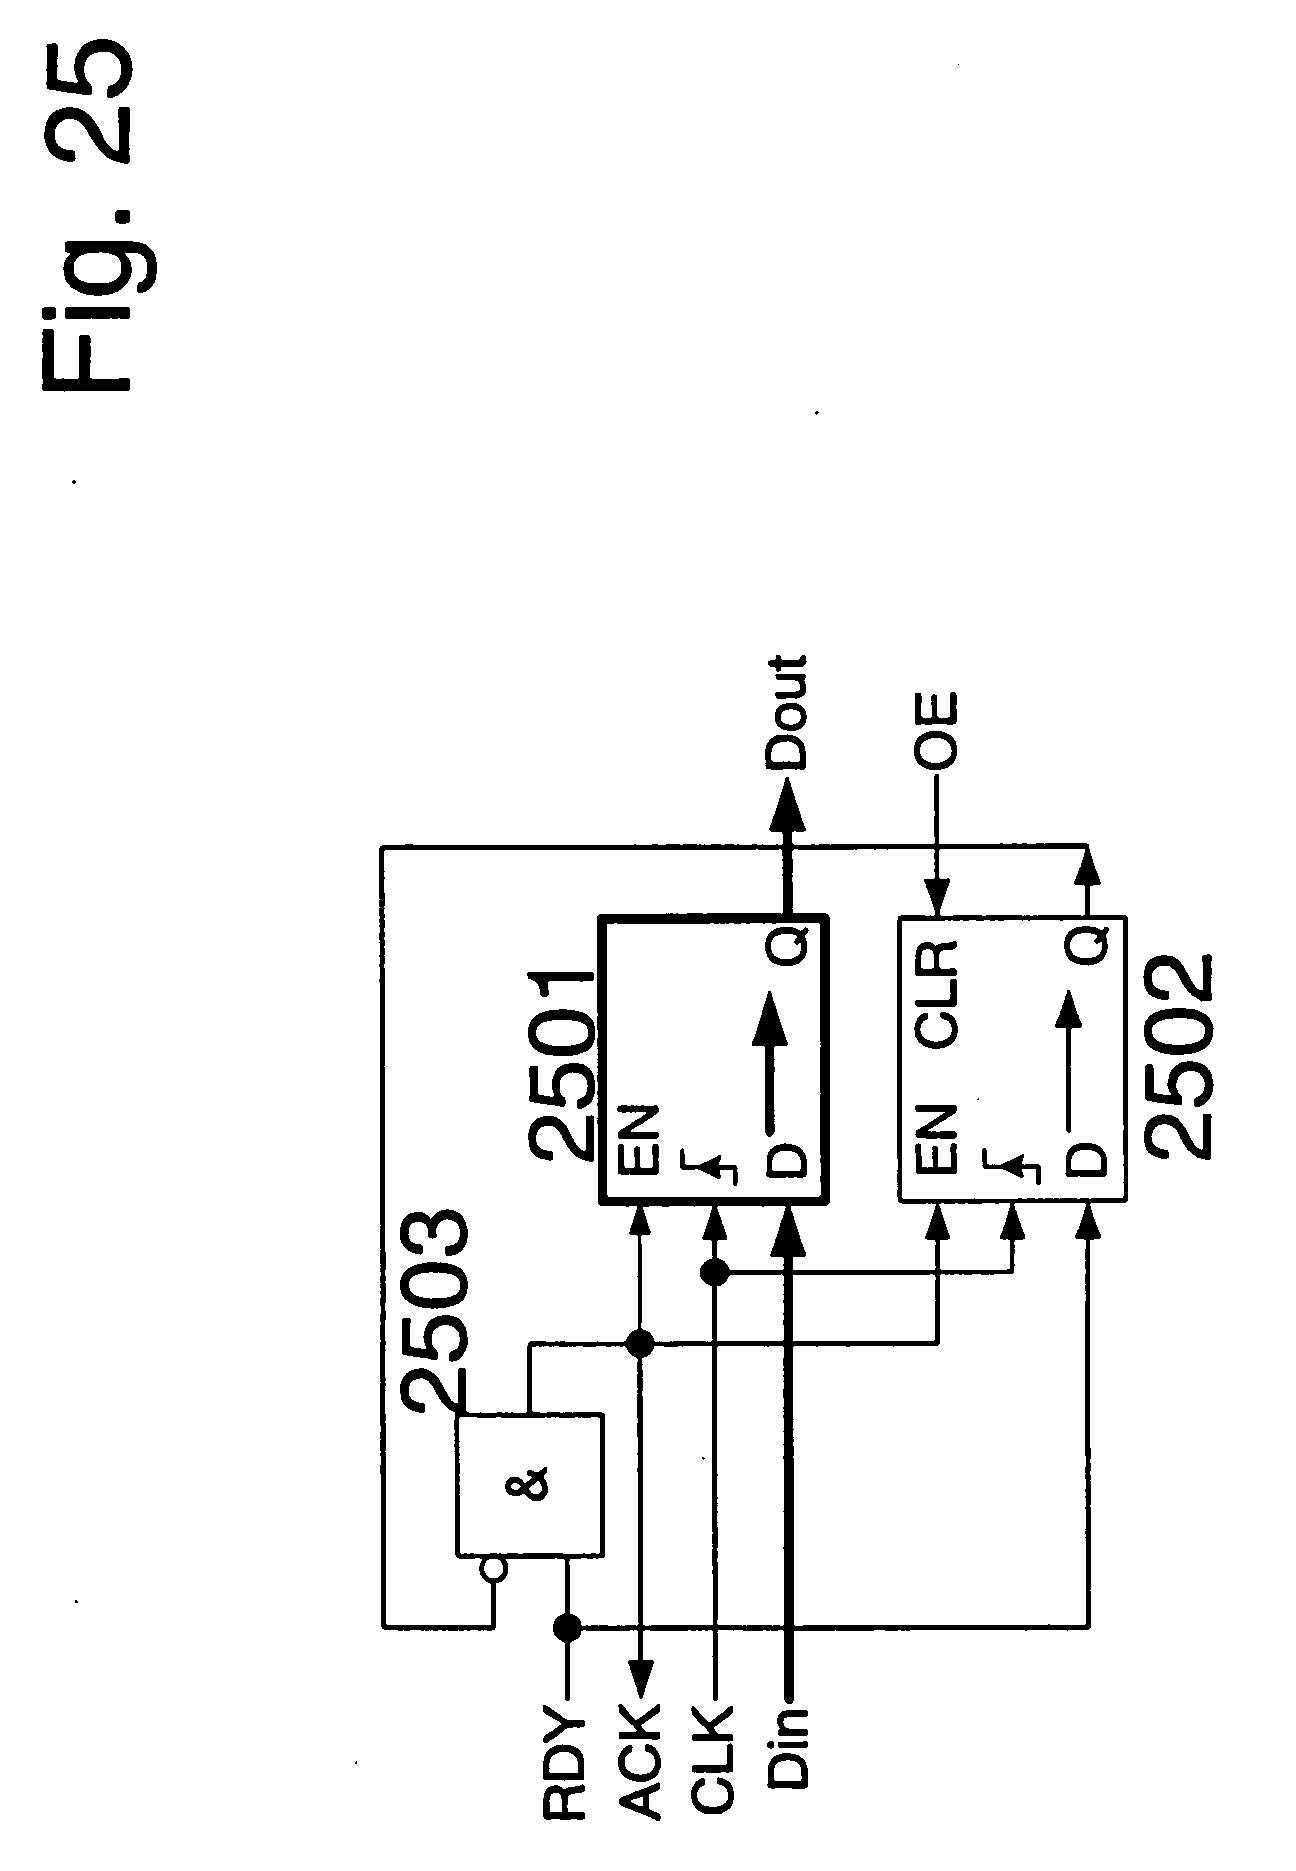 patent ep1398706a2 internes bussystem f r programmierbare zellstrukturen google patentsuche. Black Bedroom Furniture Sets. Home Design Ideas